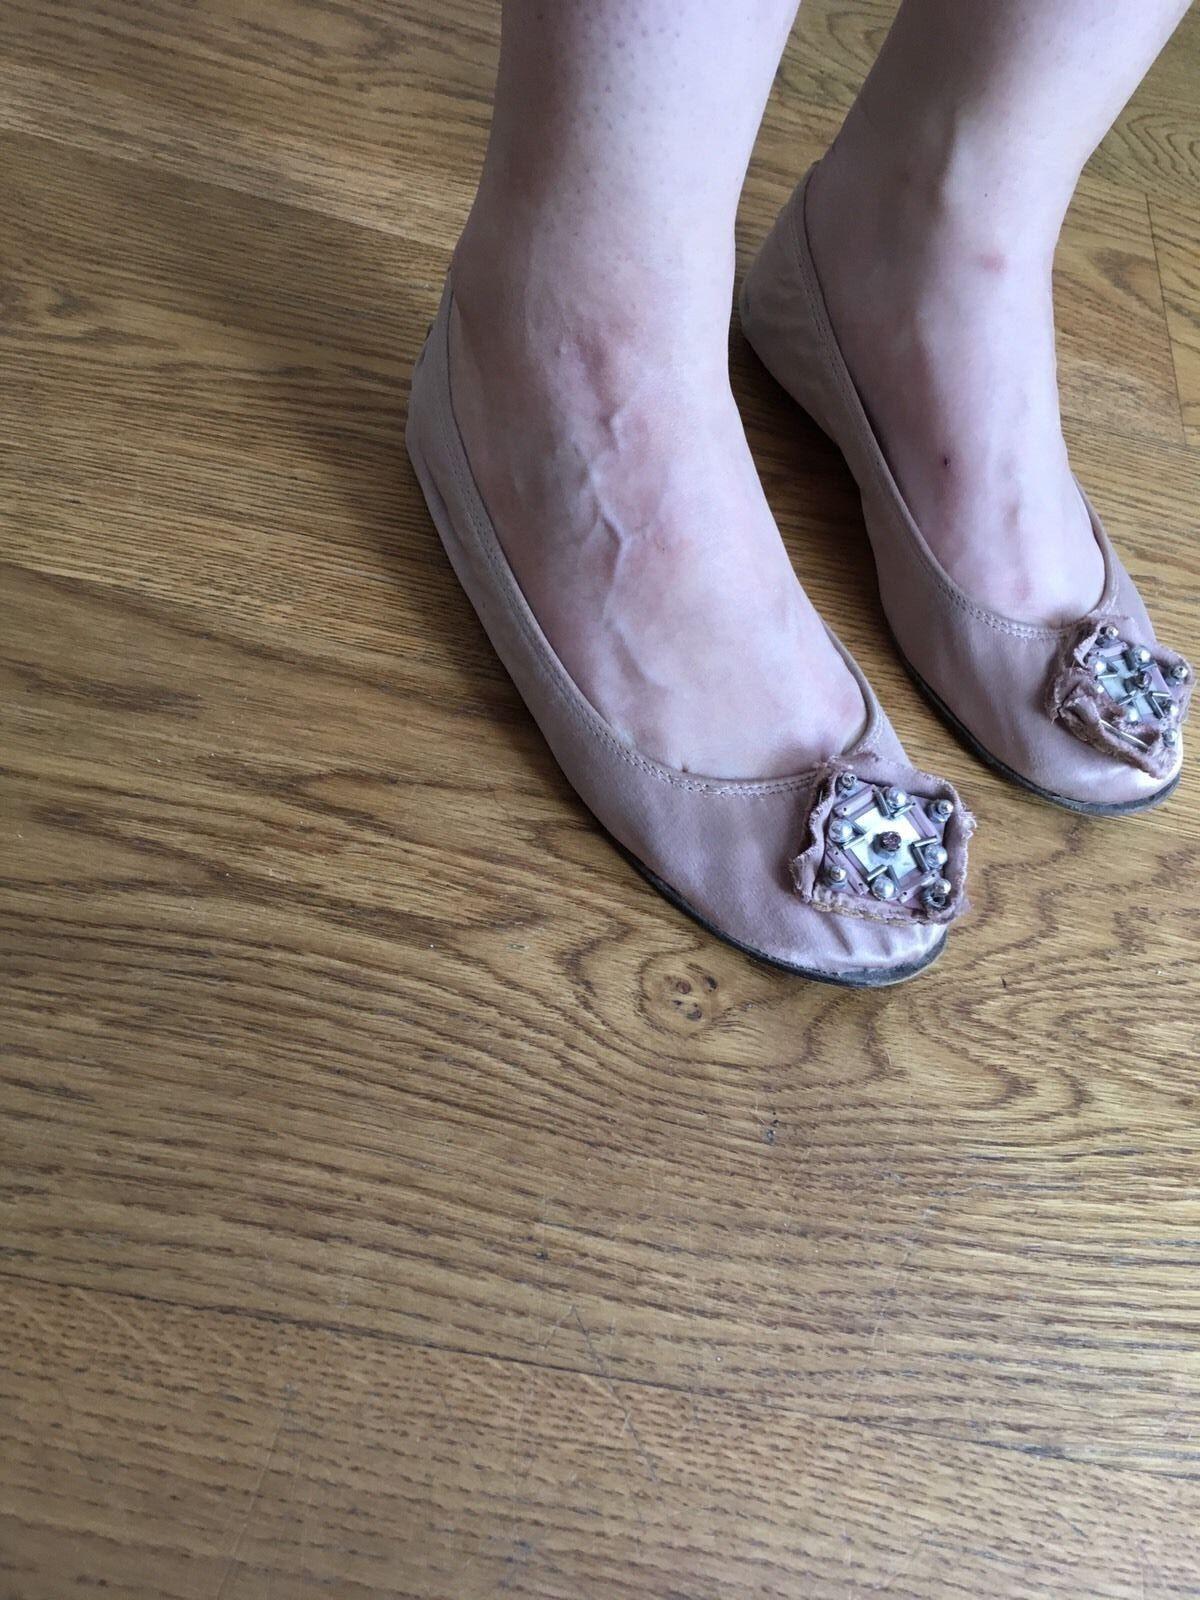 Lanvin 35 round-toe flats with beaded embellishments flats Sz 35 Lanvin UK 2 US 5 c7a769